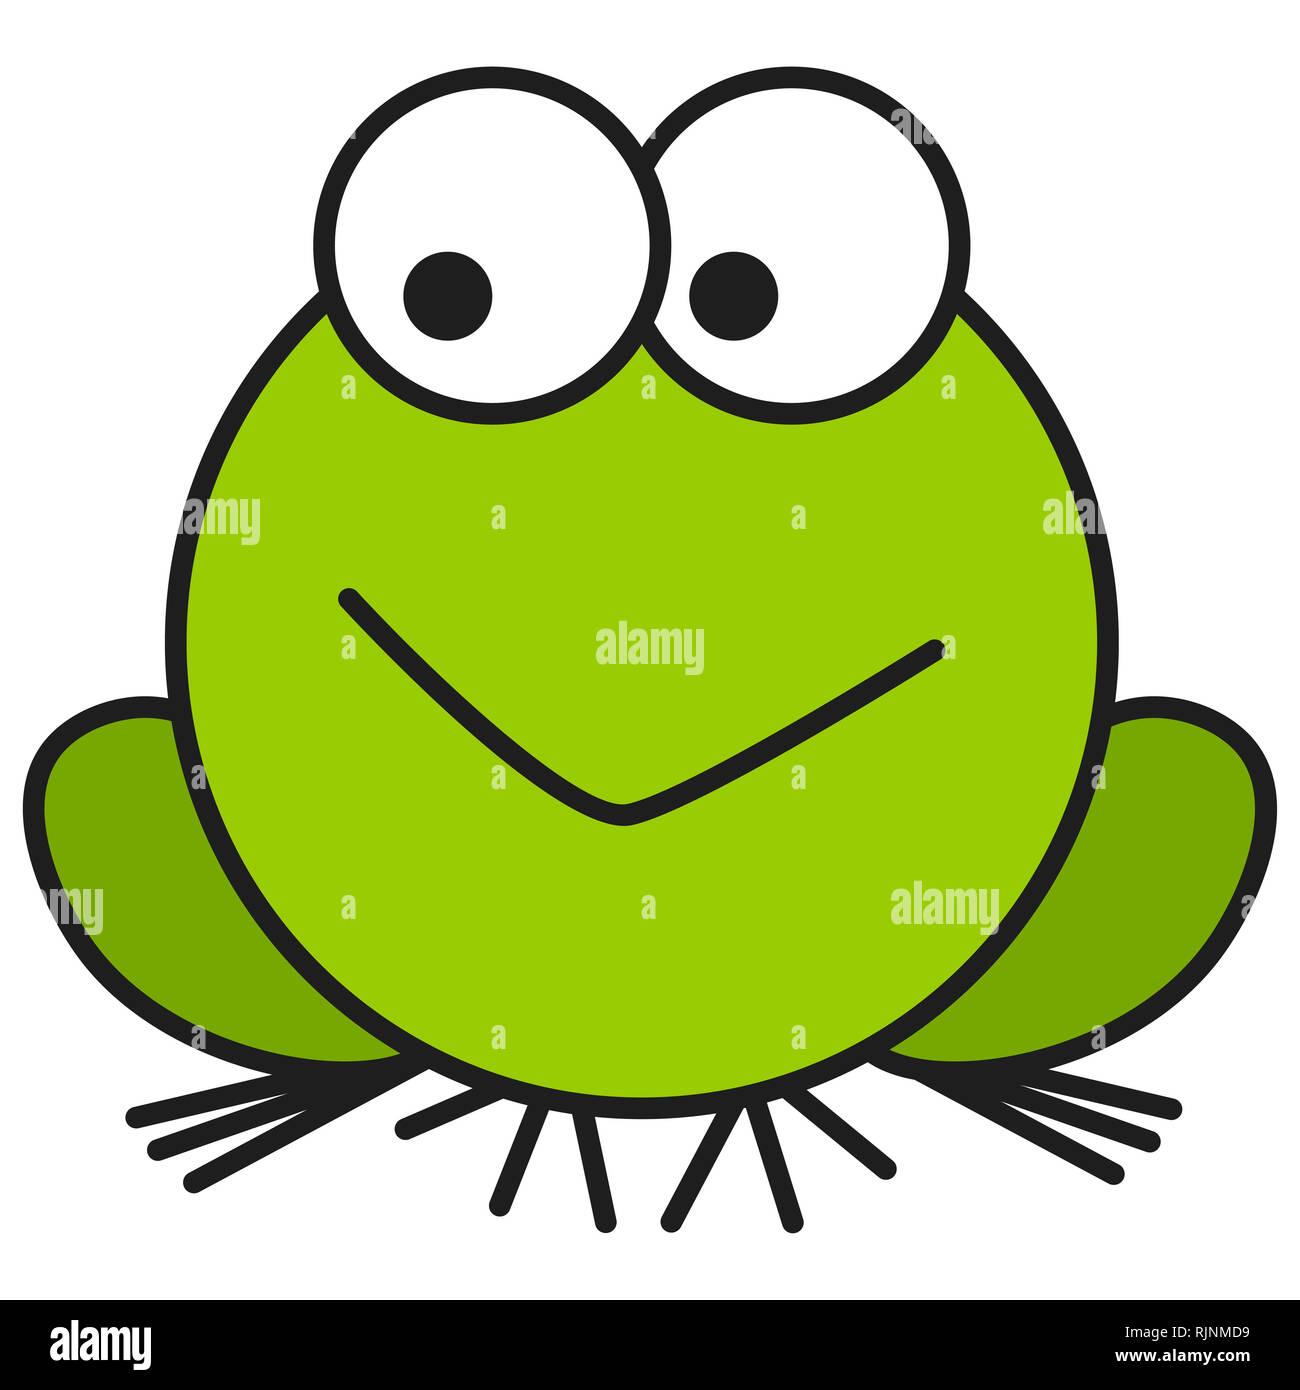 Frog in cartoon style. On white background,  illustration Stock Photo